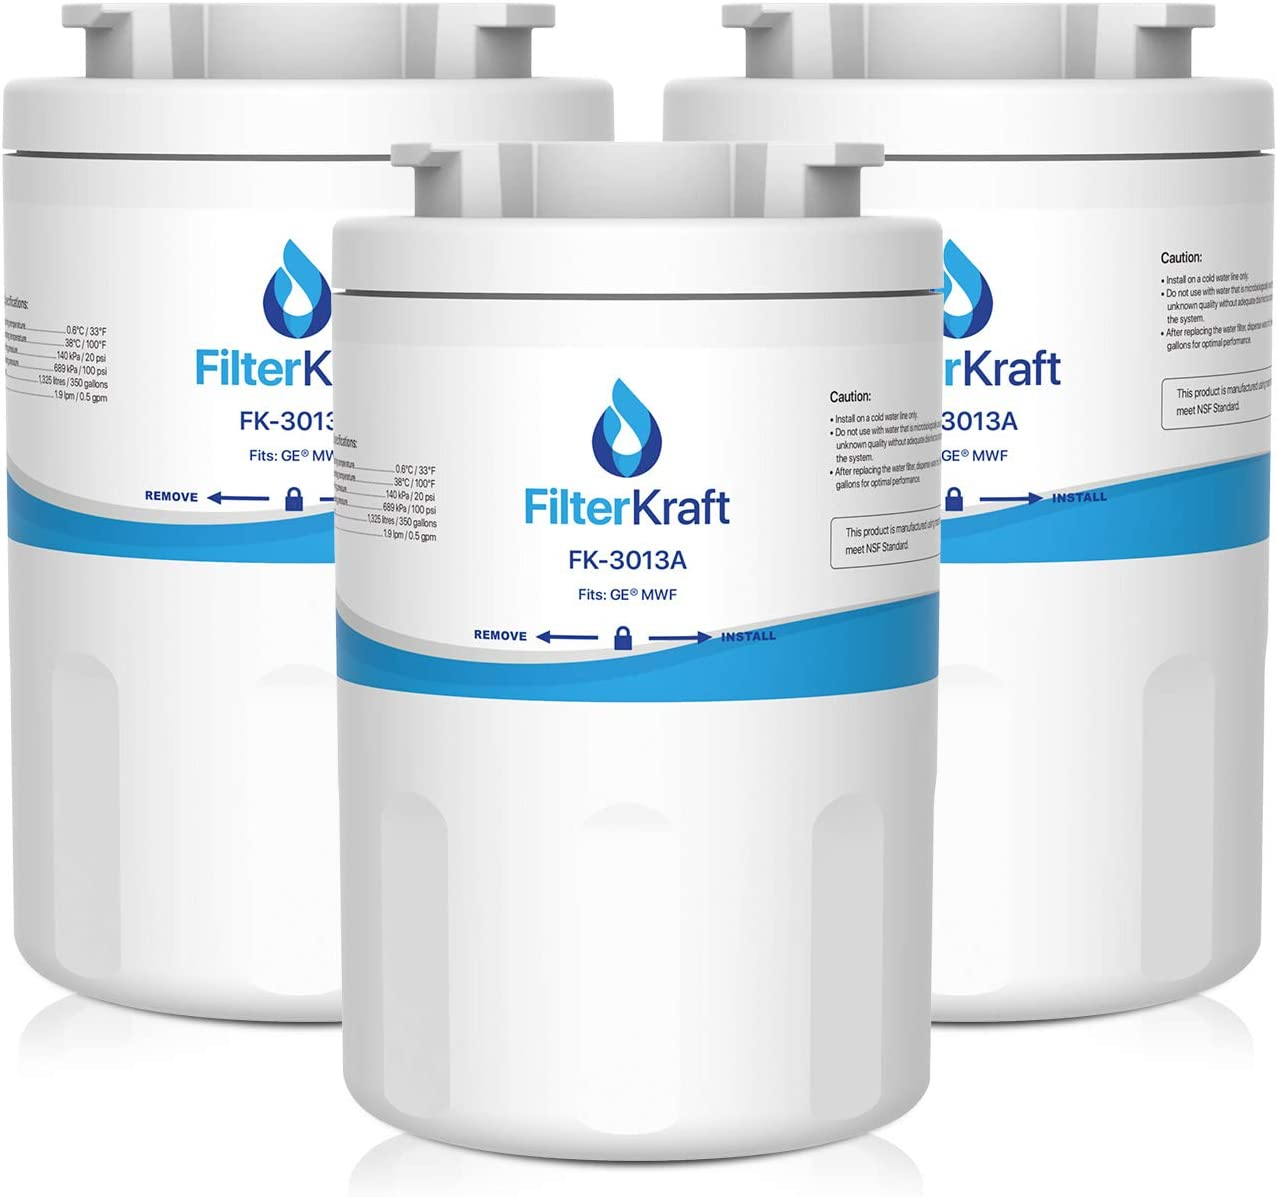 FilterKraft FK-3013A cartucho de filtro de agua interno compatible ...